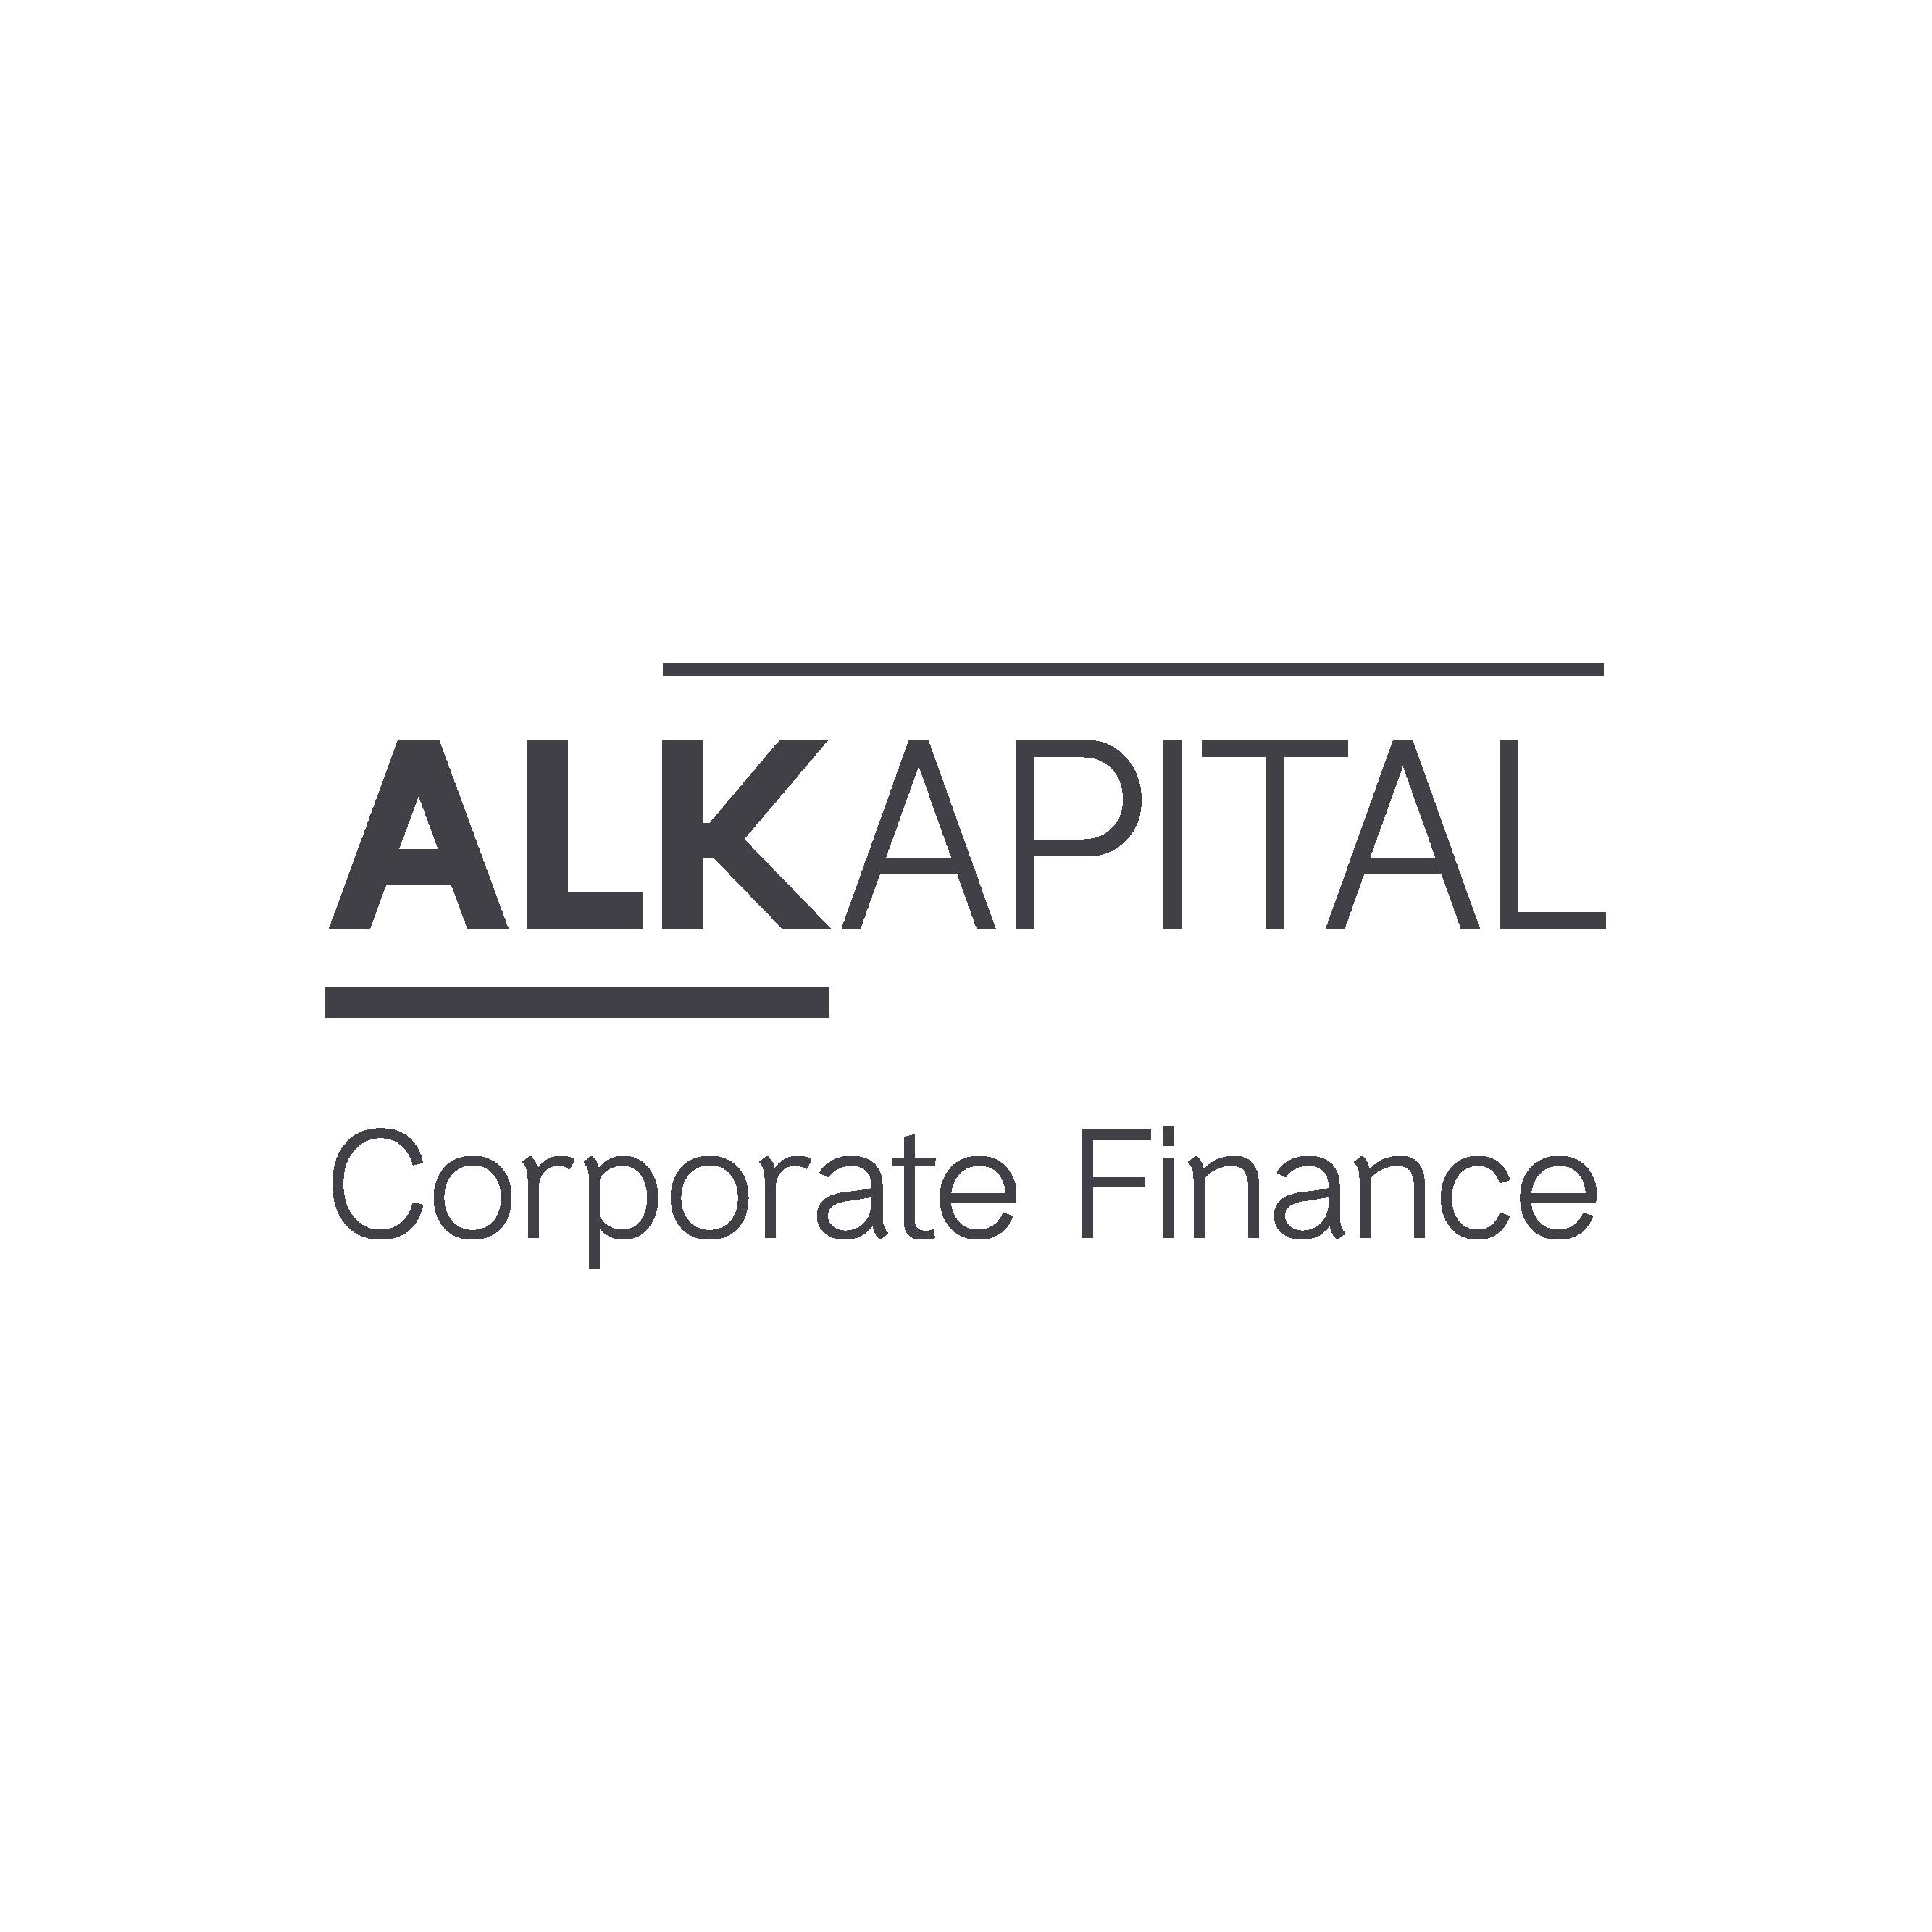 Alkapital - Corporate Finance, Lda's logo